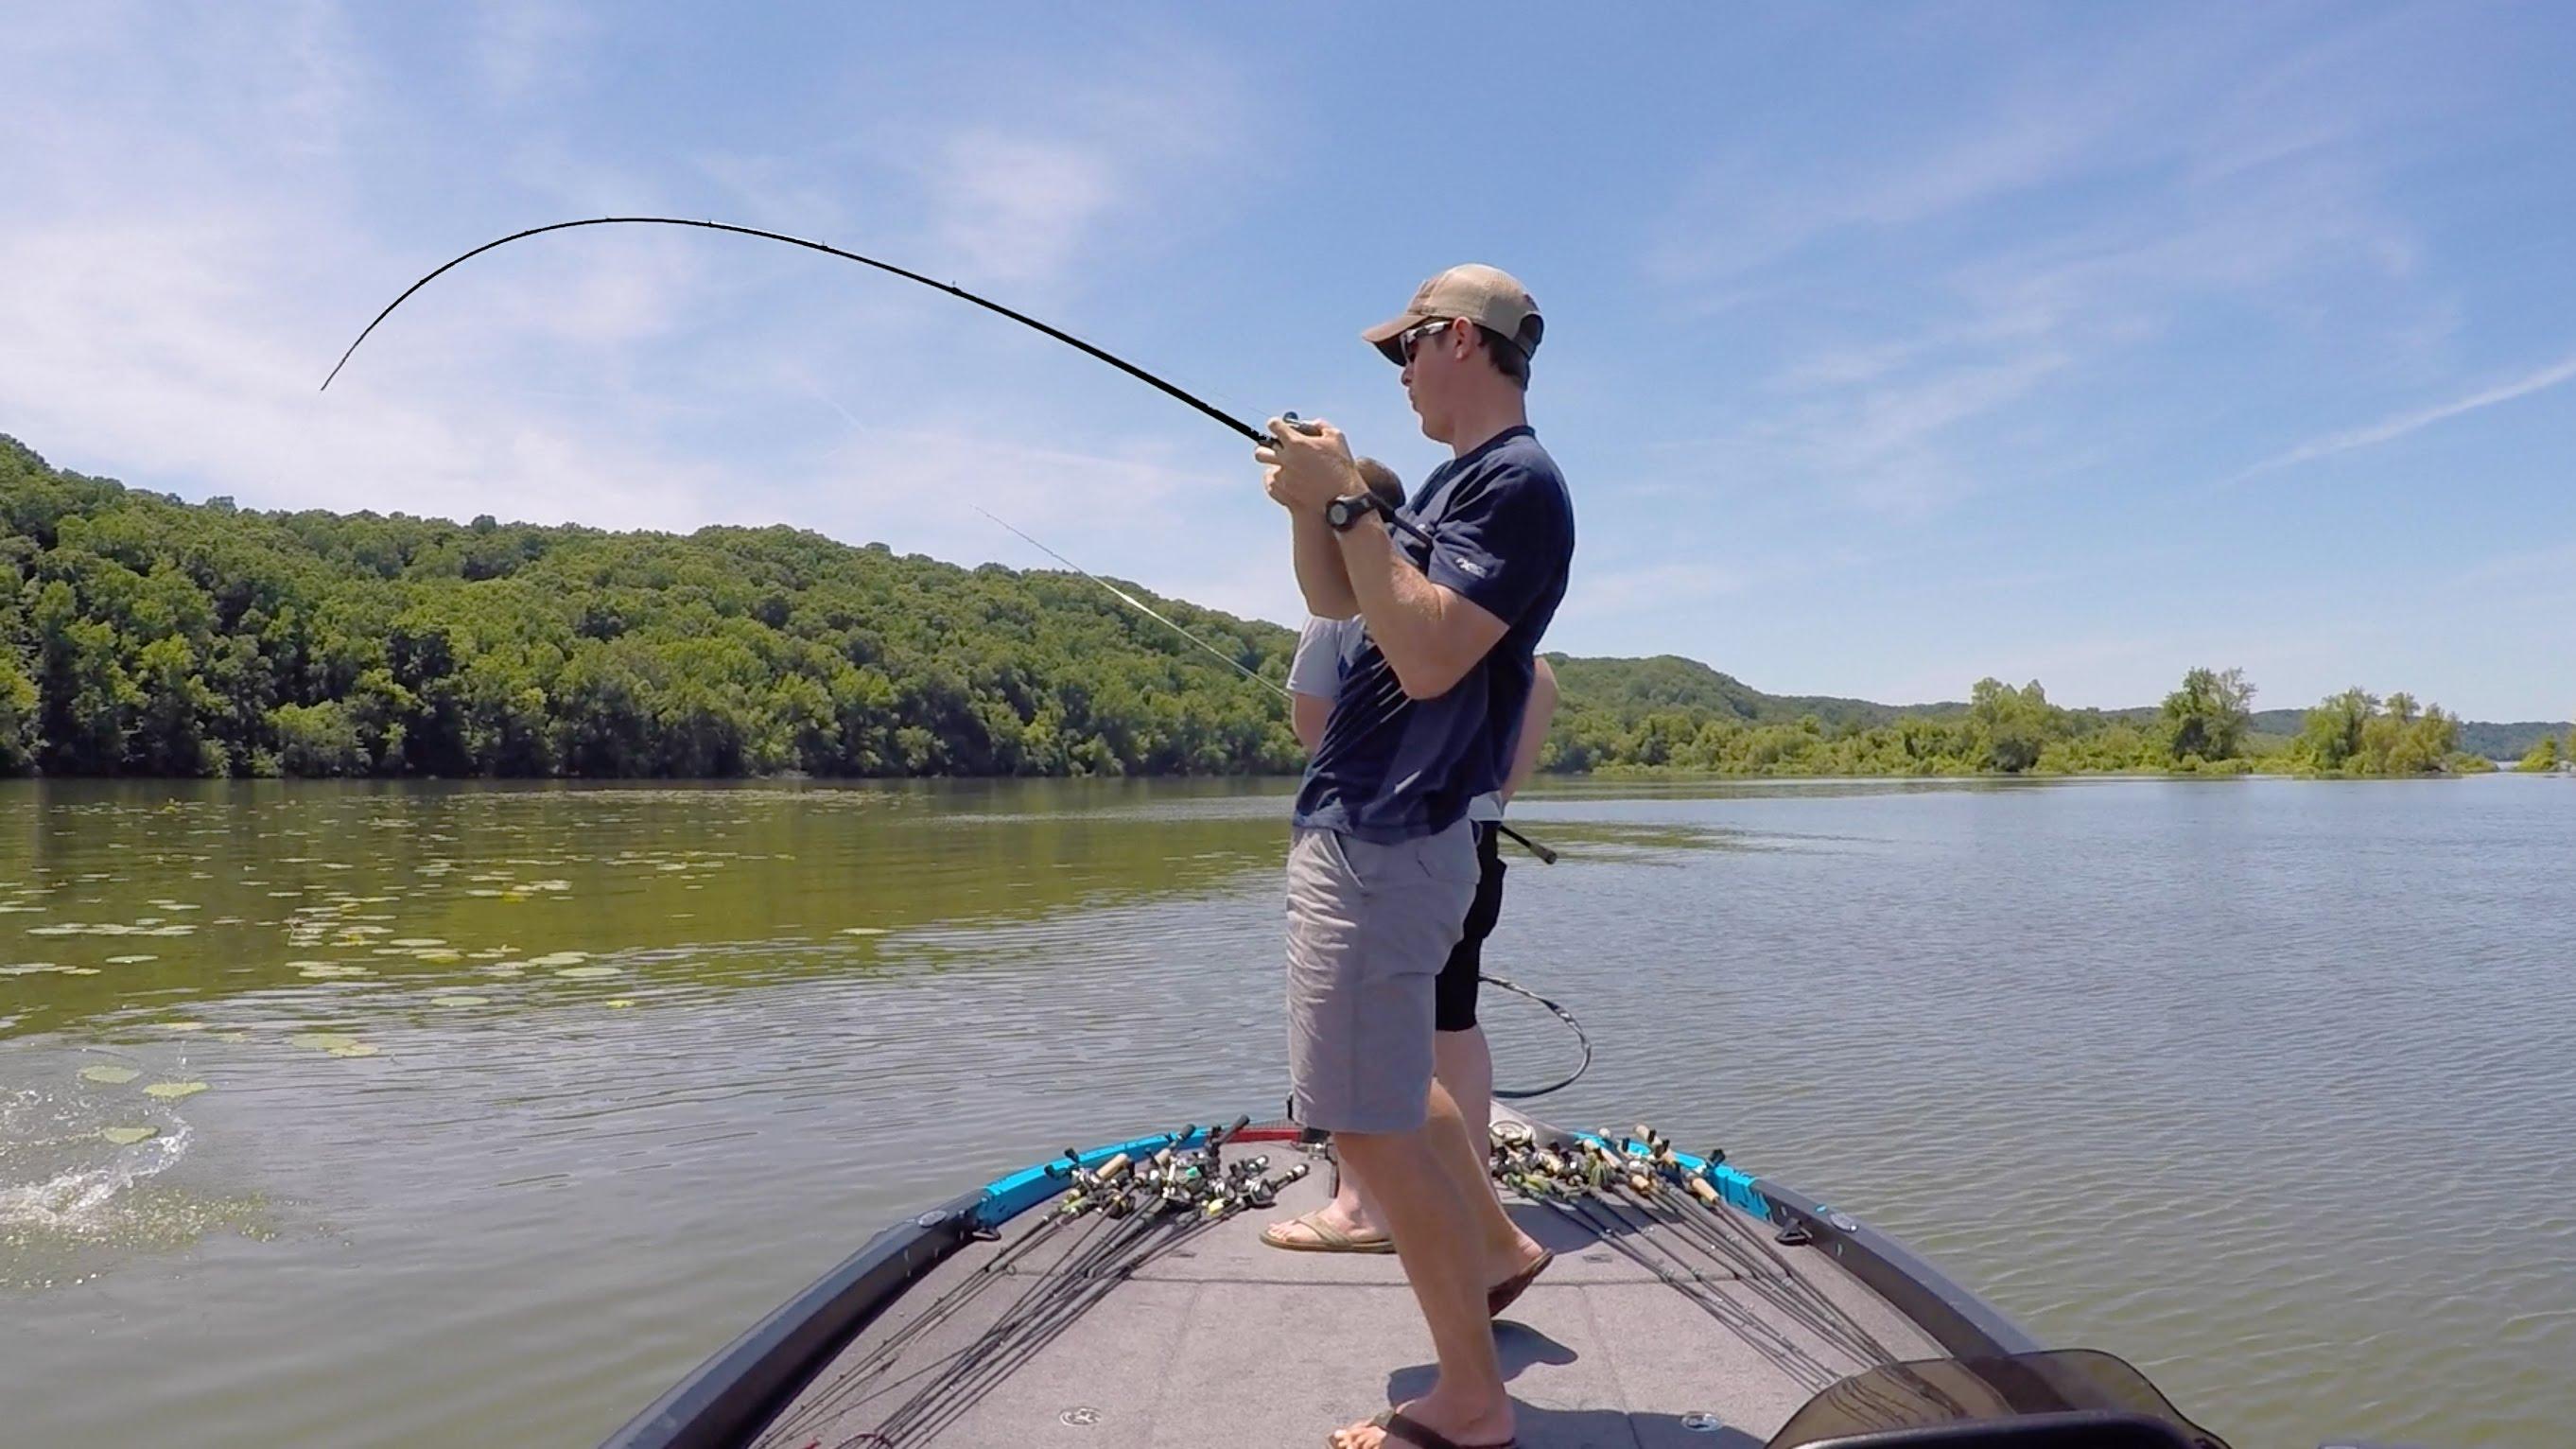 Lakeforkguy kentucky lake bass fishing day 2 angler hq for Kentucky lake fishing